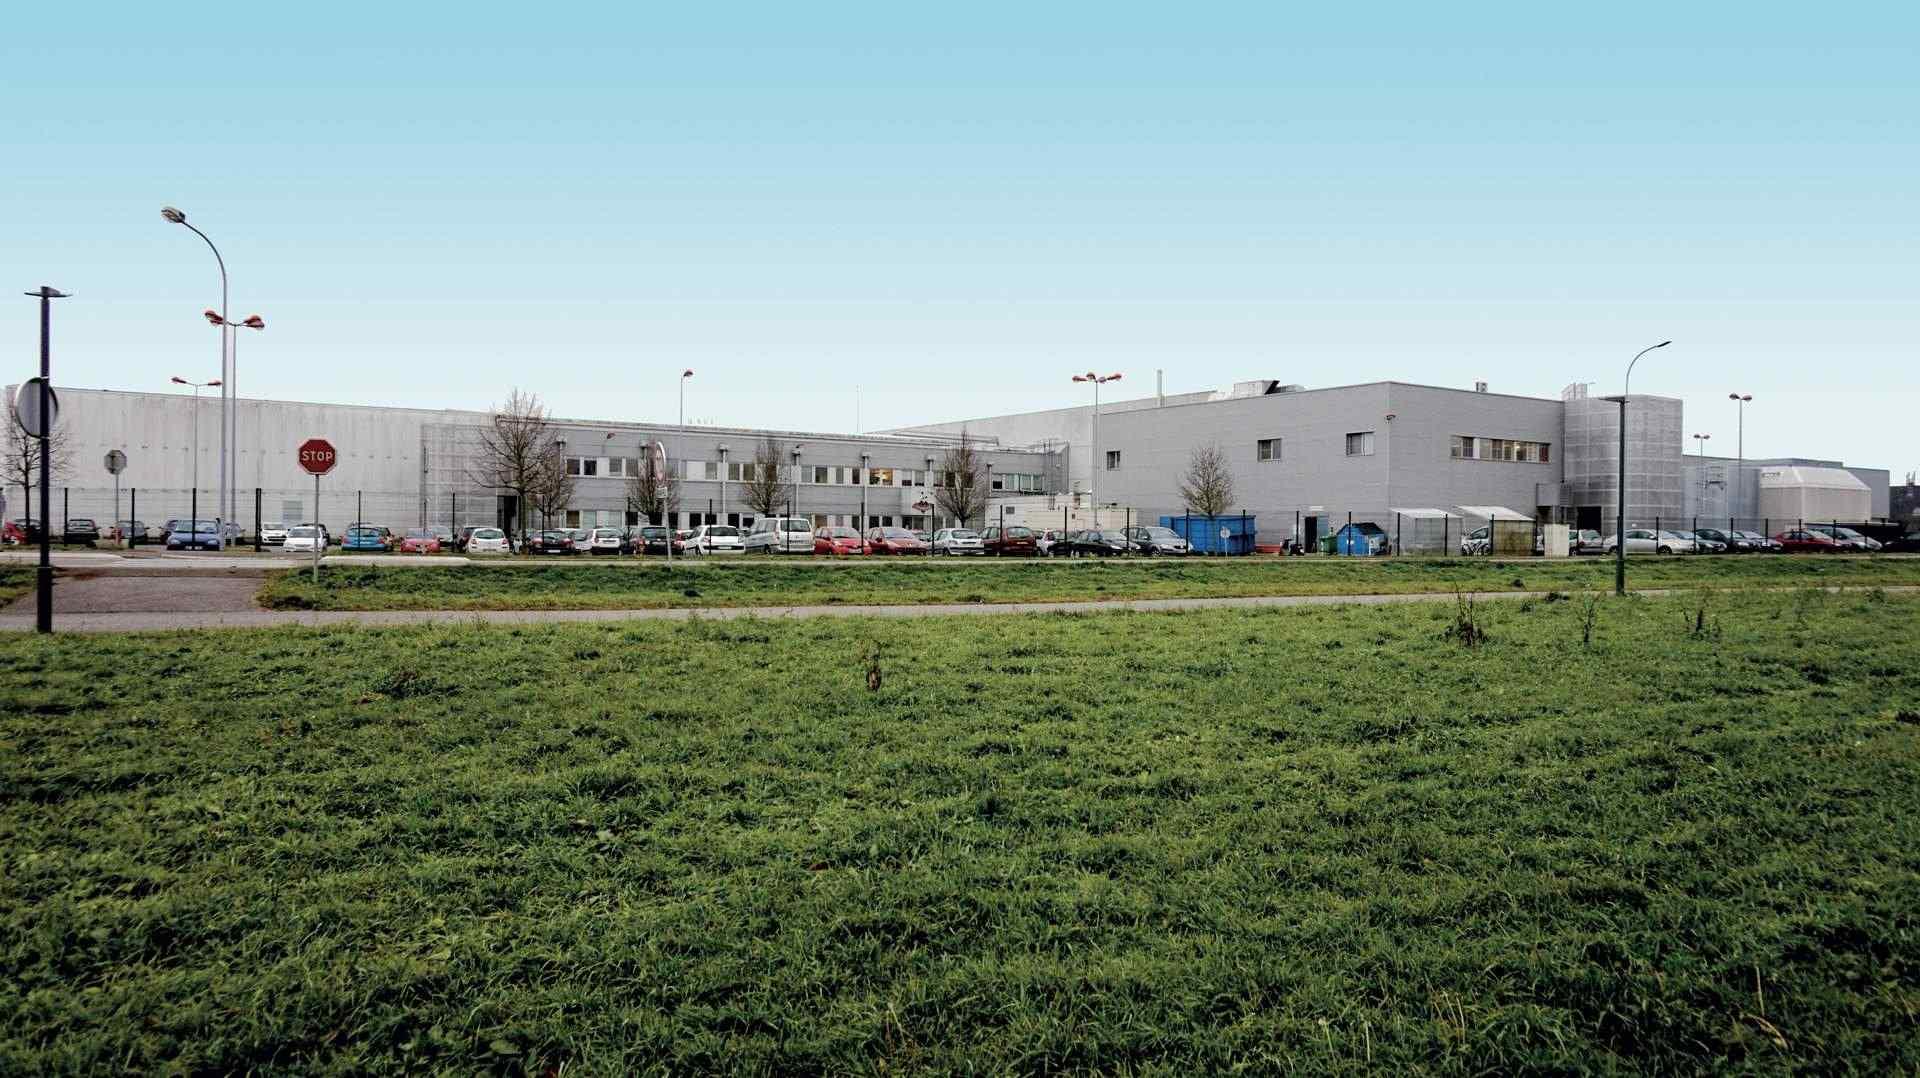 Cical usine ingénierie industrielle